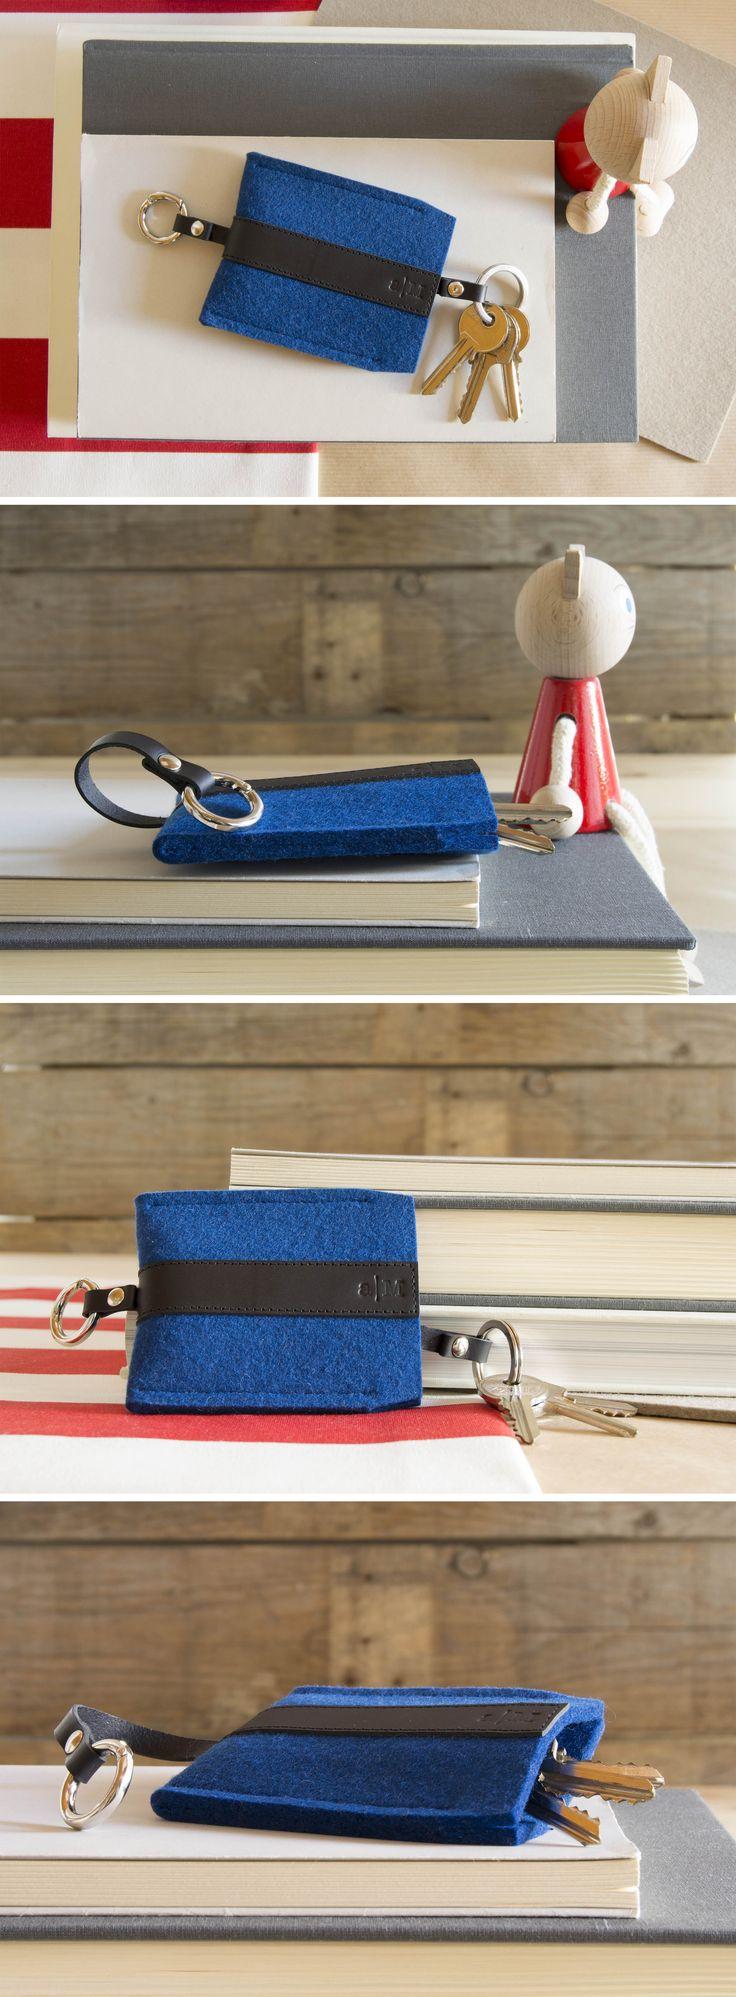 Wool felt and leather key holder by anonimaMente design #woolfelt #keyholder #keychain #vegetabletannedleather #leather #madeinitaly